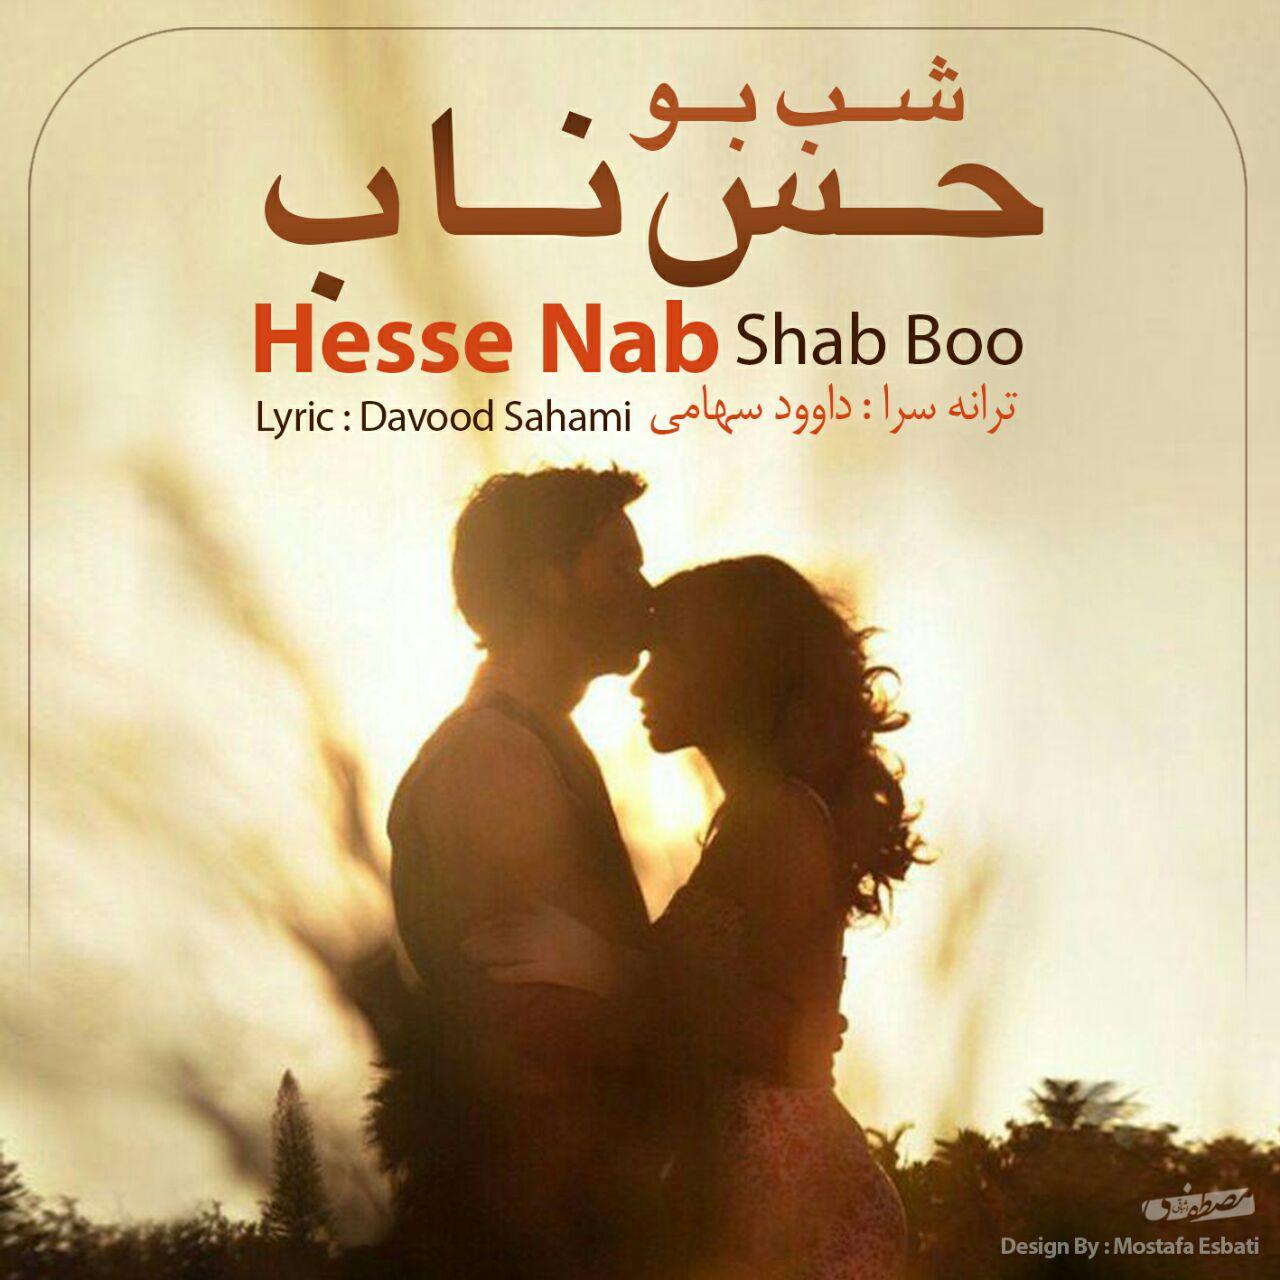 Shab Boo – Hesse Nab